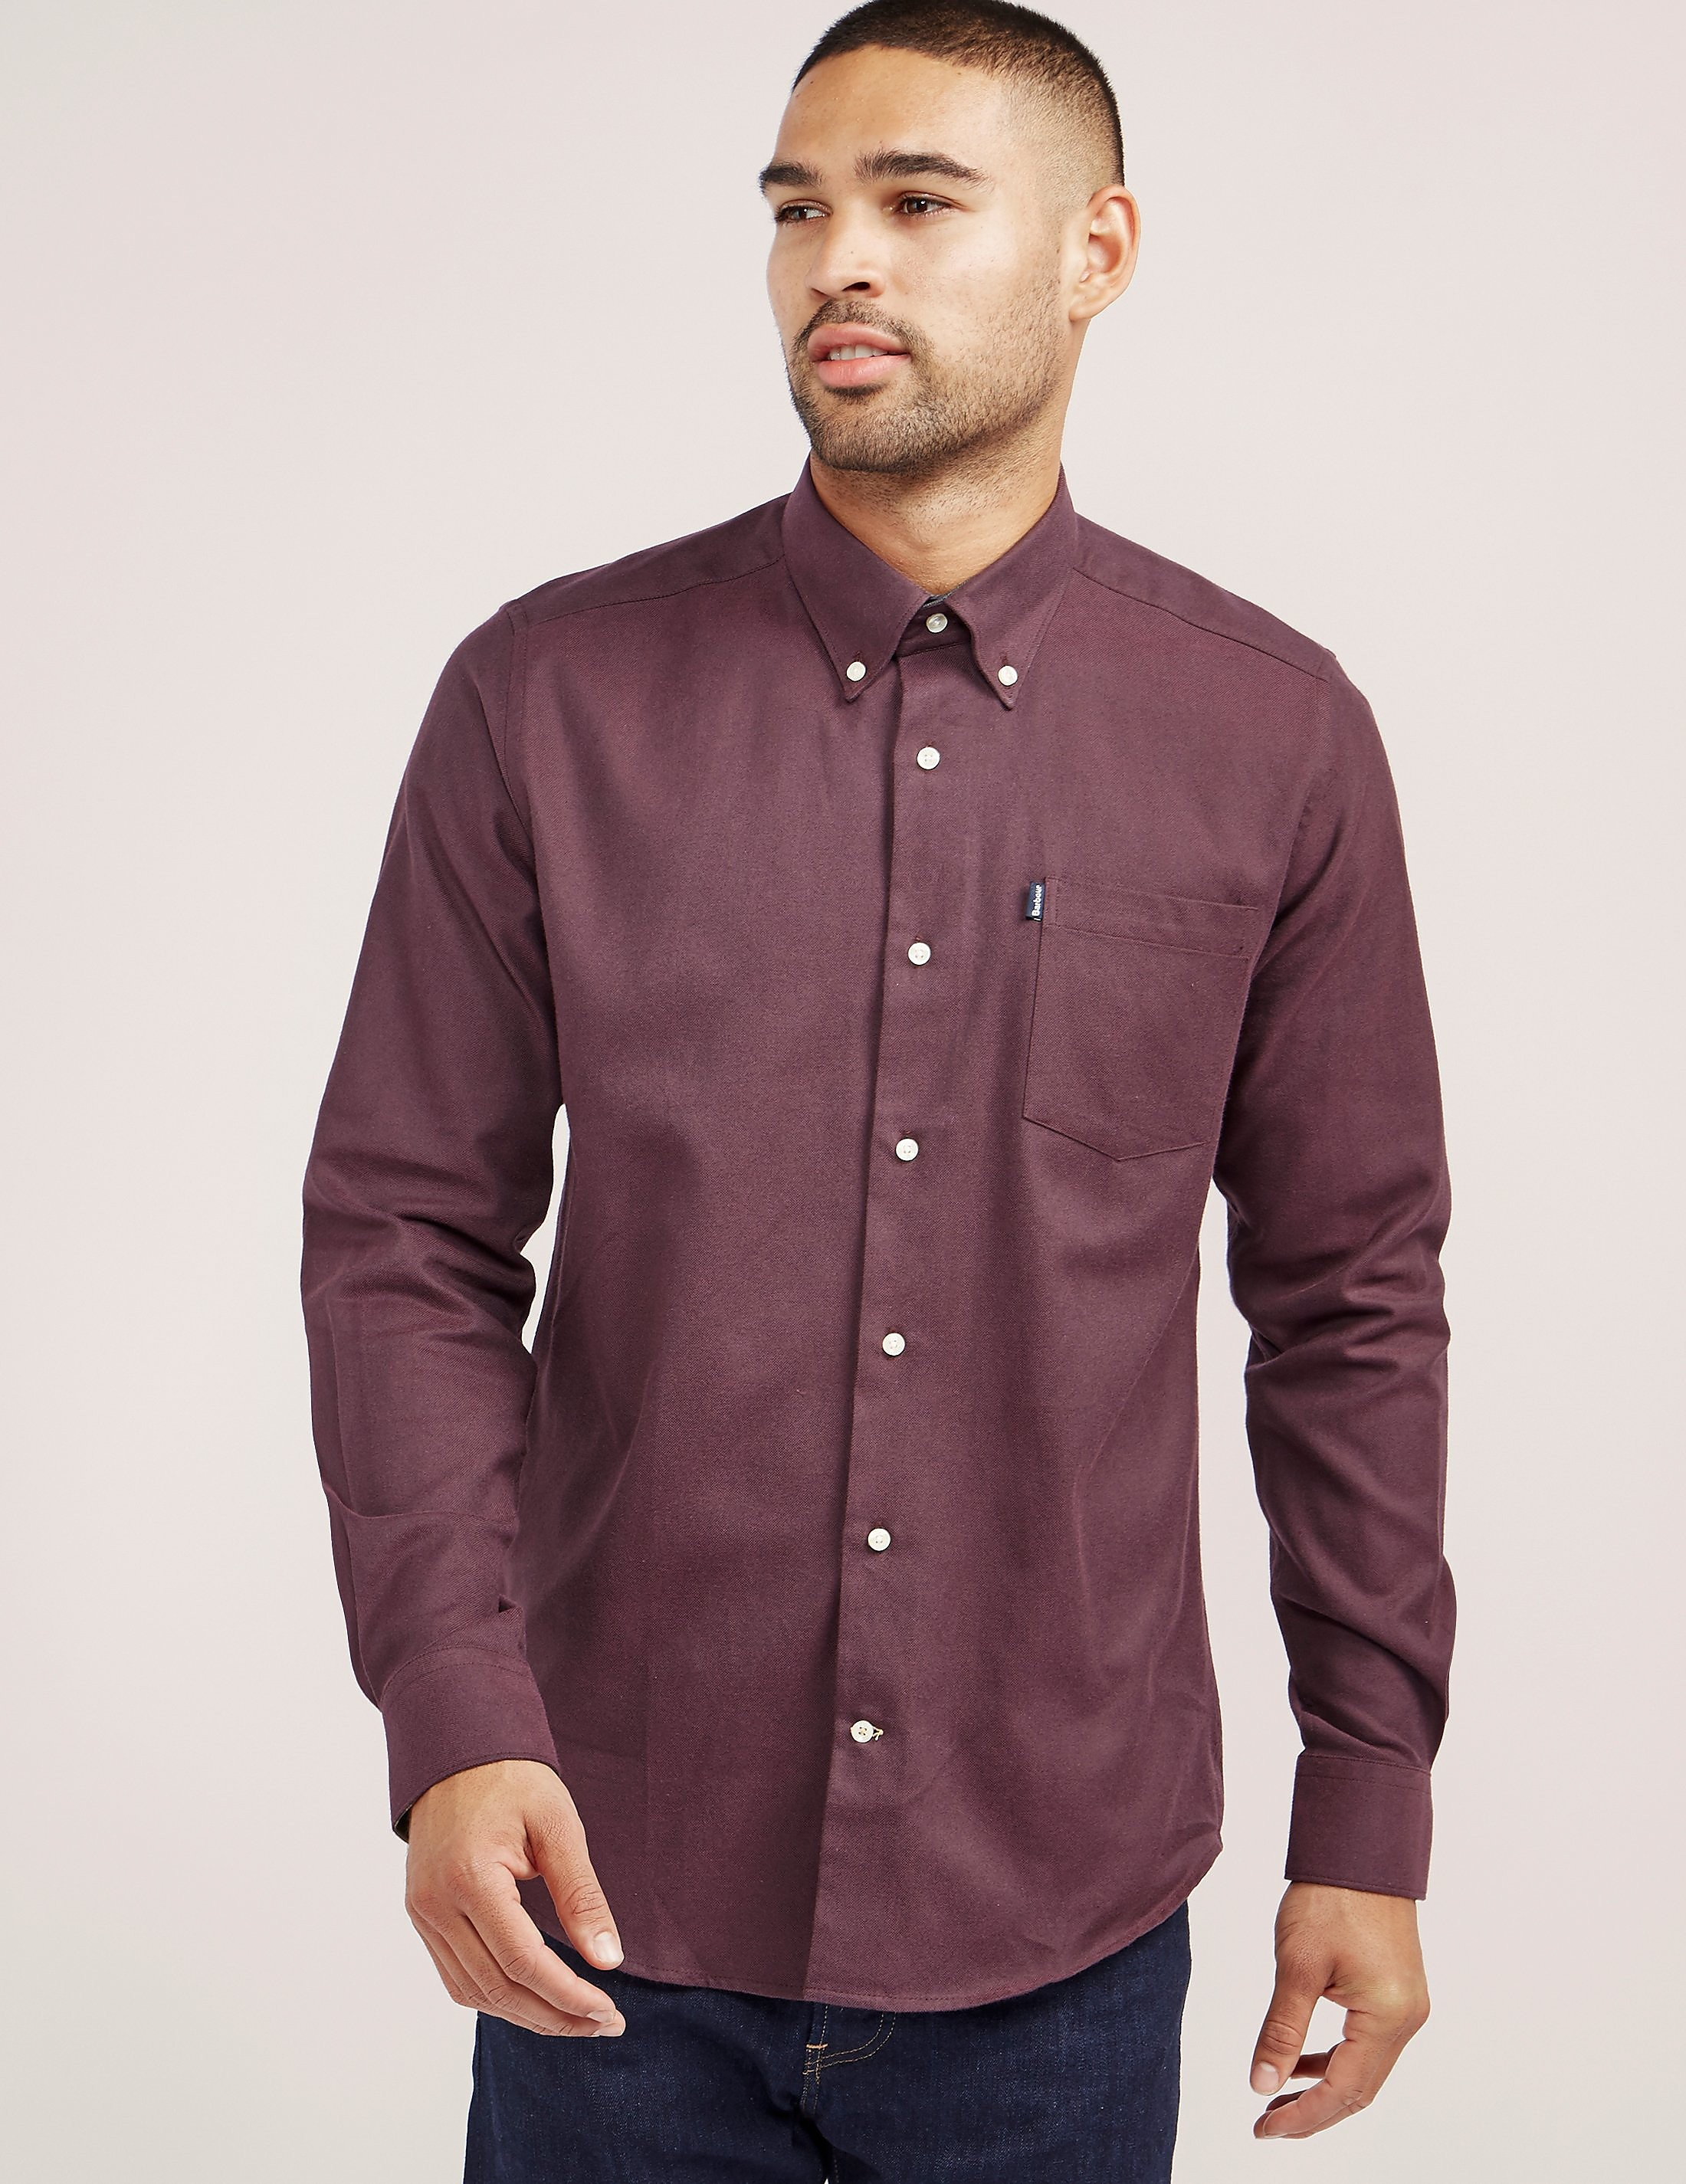 Barbour Don Long Sleeve Shirt